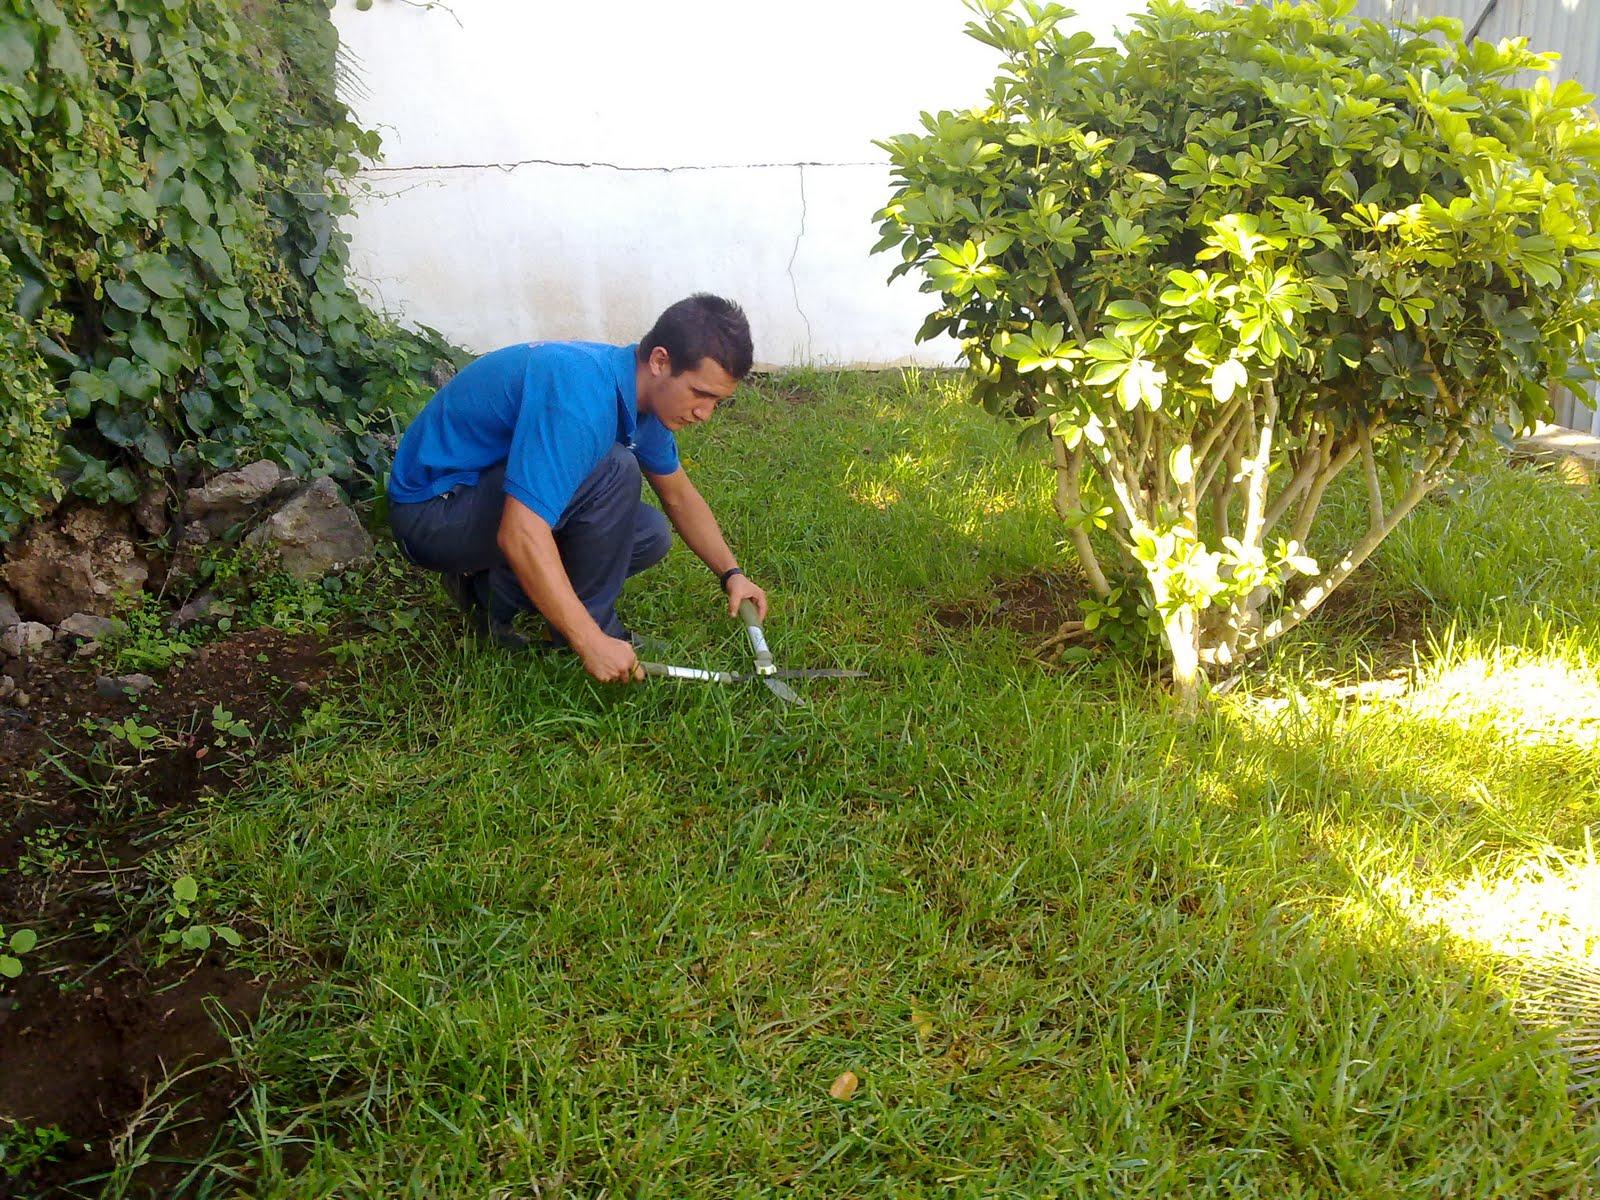 Curso auxiliar jardineria cort ndo c sped vivero for Auxiliar jardineria